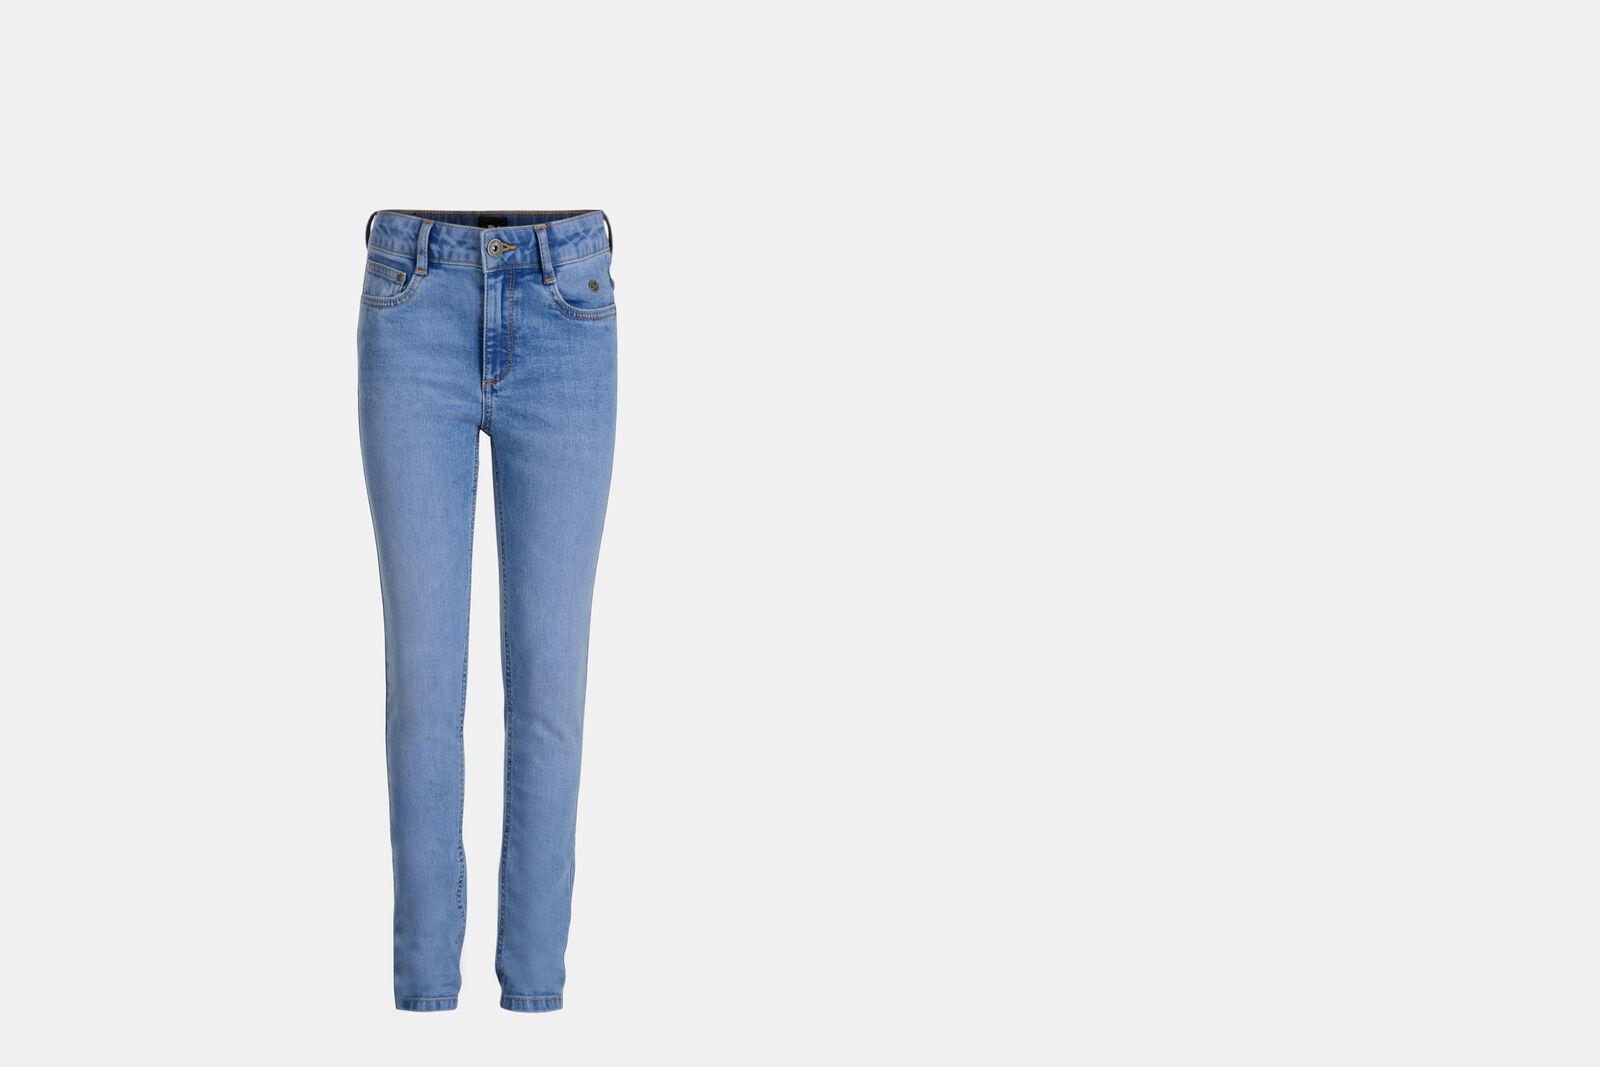 Avelon Skinny Jeans